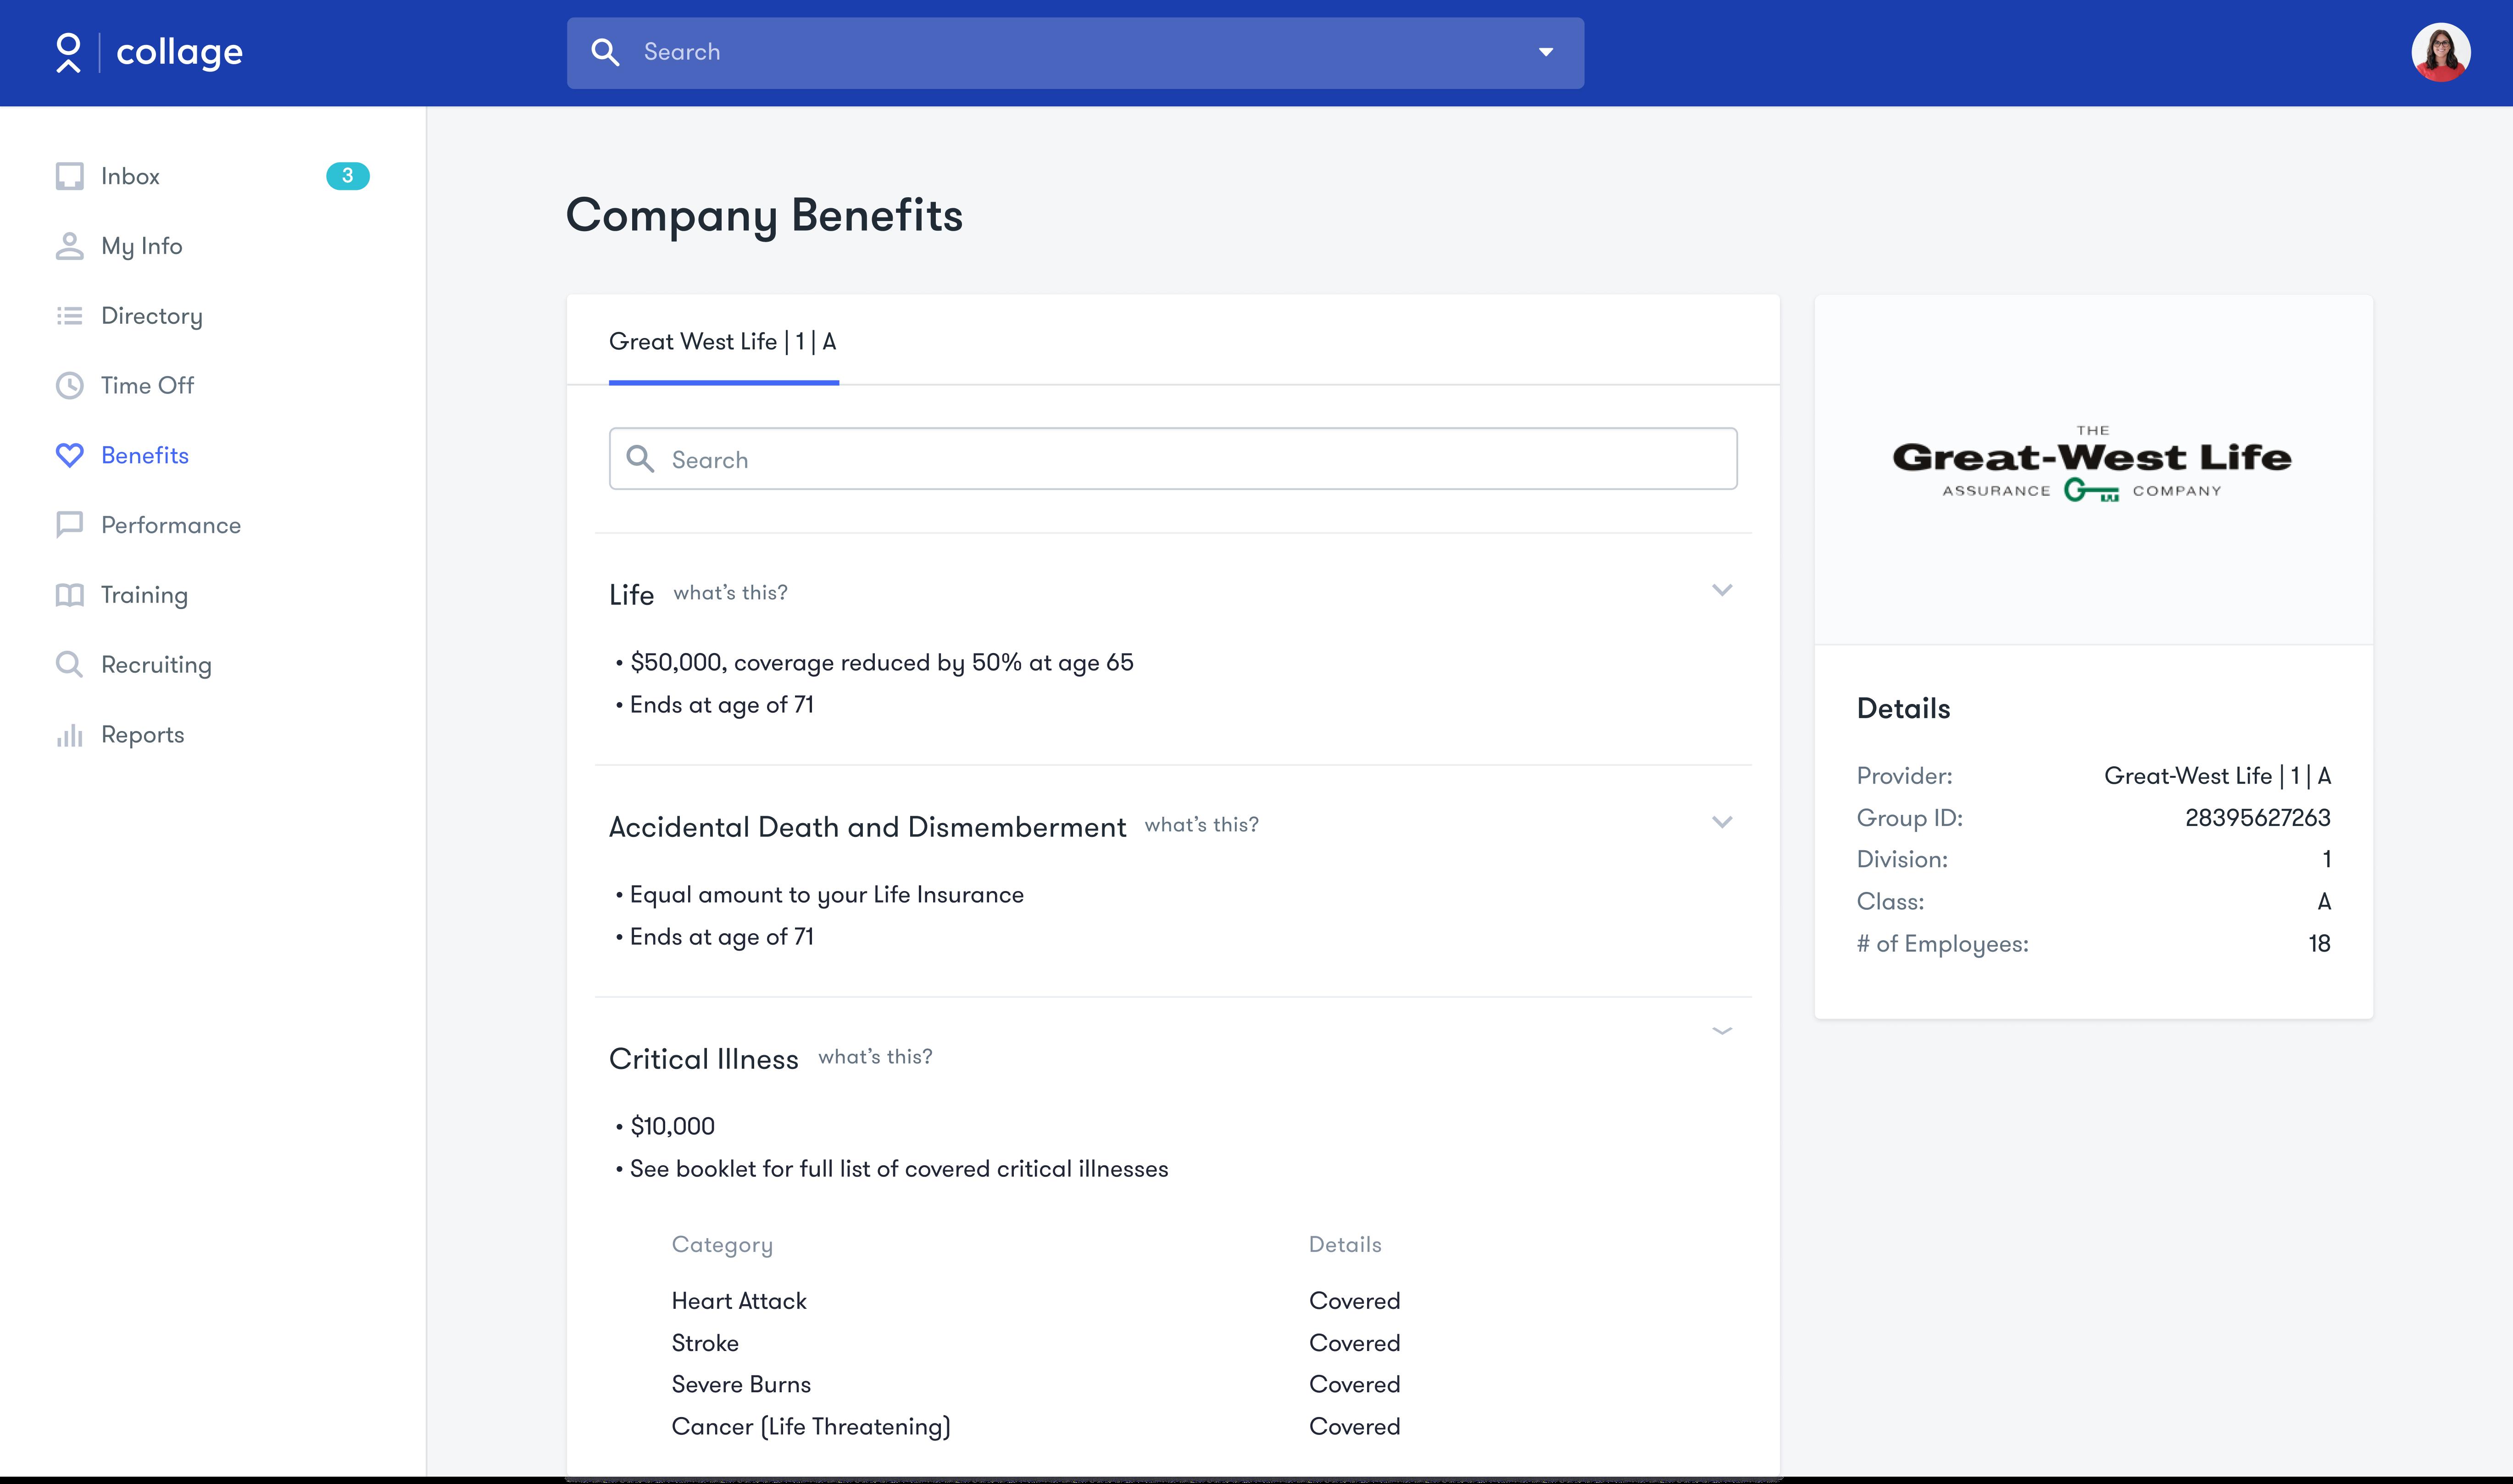 Collage HR Software - Benefits Summary